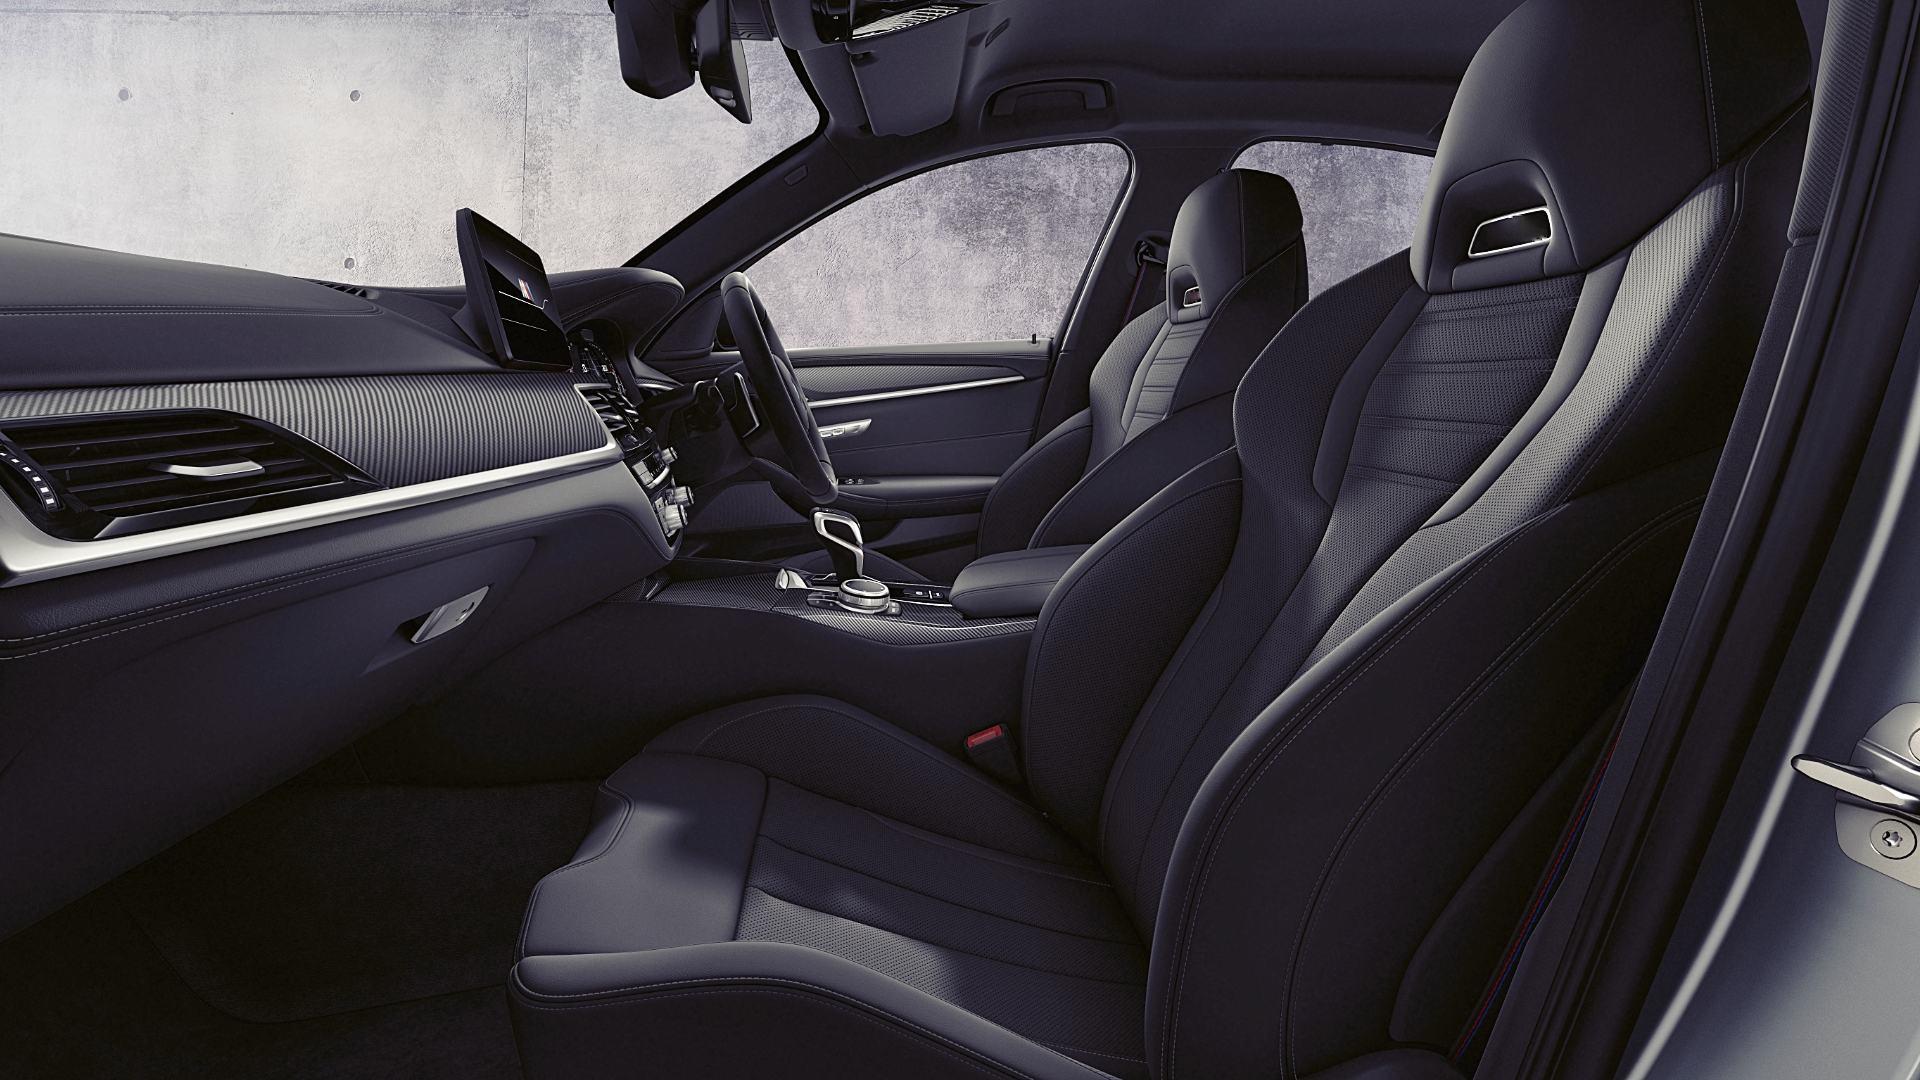 2021 BMW M5 Inside Interior